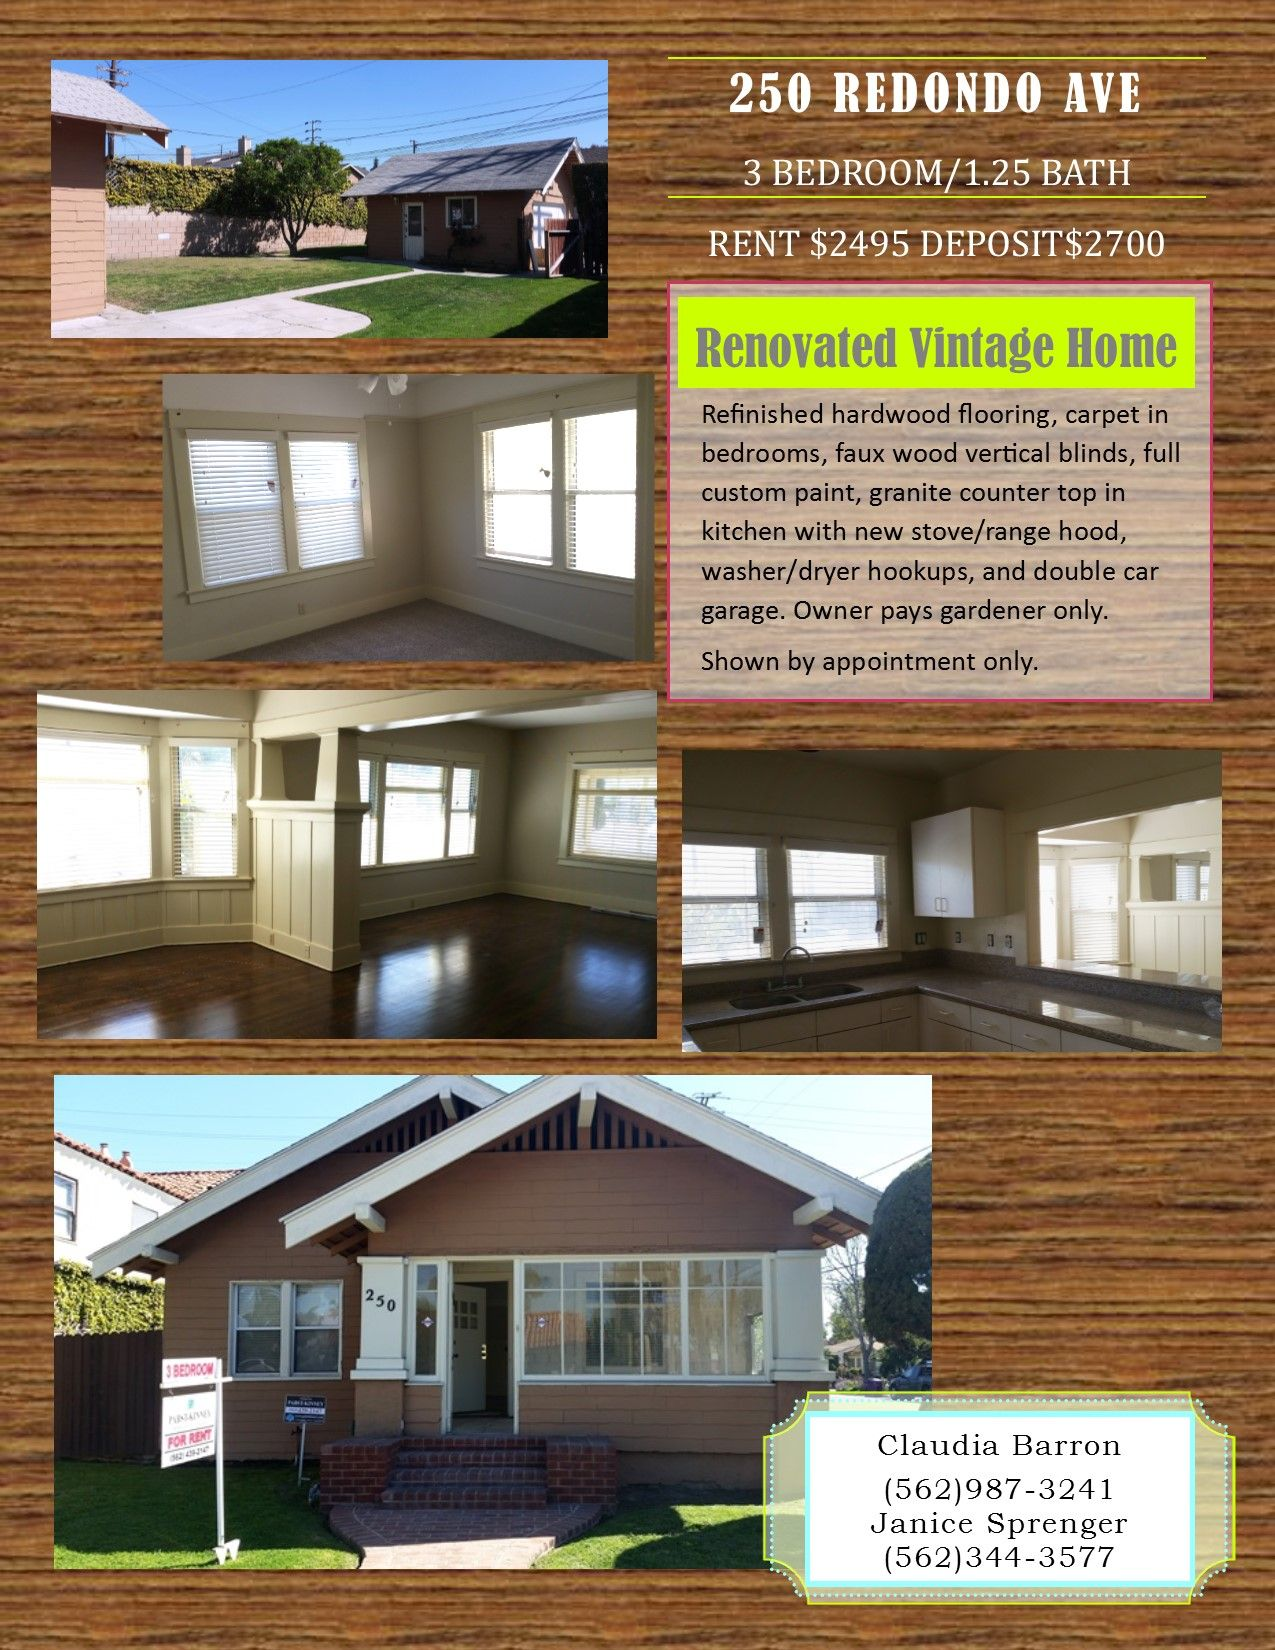 167b891e01b579039b85a2ef69c94156 - House For Rent By Owner In Bell Gardens Ca